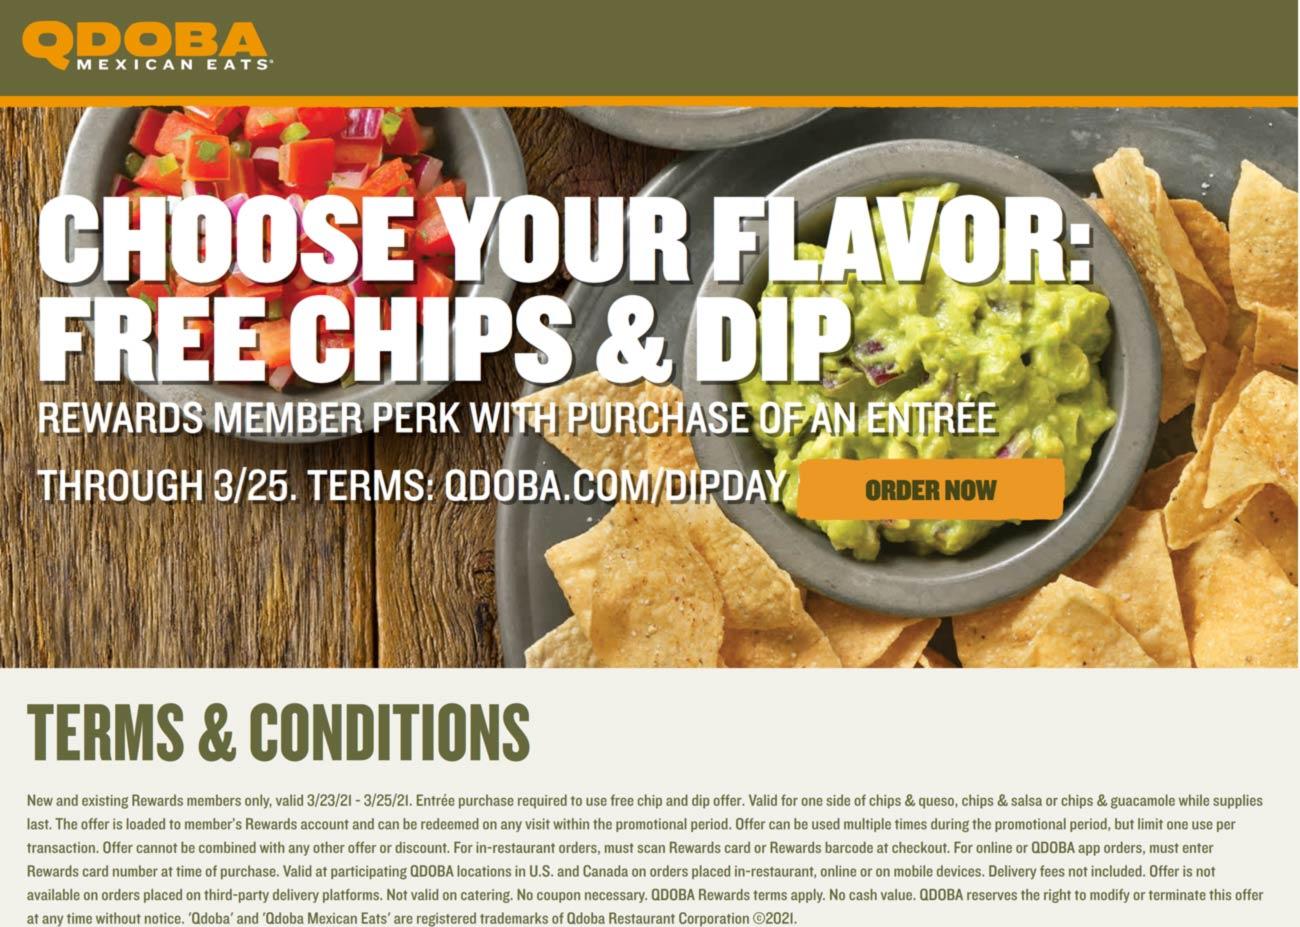 Qdoba restaurants Coupon  Free chips & dip with your entree for rewards peeps at Qdoba #qdoba